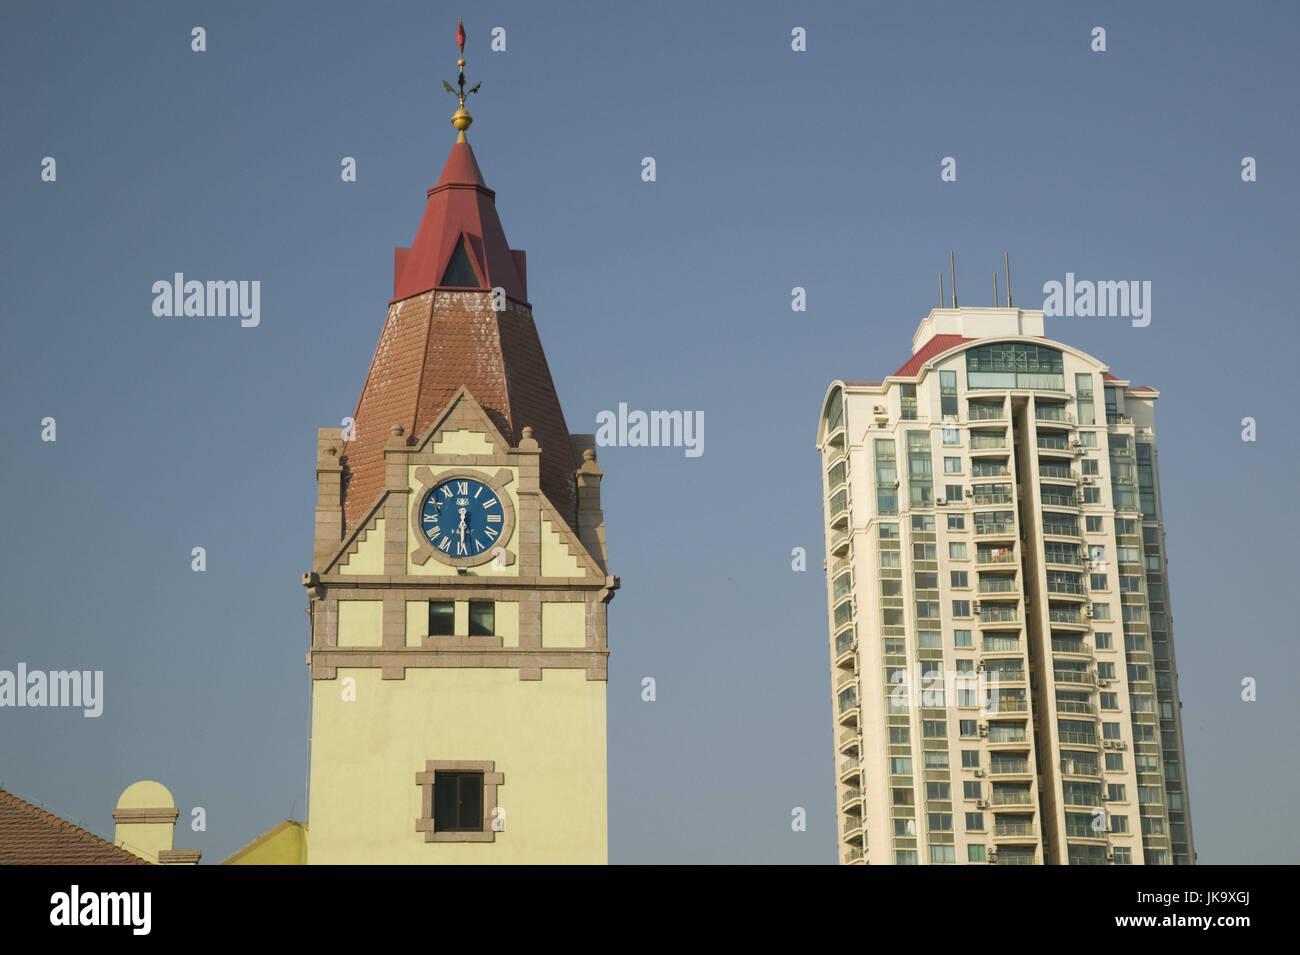 China, Qingdao, Altstadt, Bahnhof, Hochhaus, Edelstahlsockel, Detail, Asien, Ostasien, Stadt, Gebäude, Wohnhochhaus, Stockbild